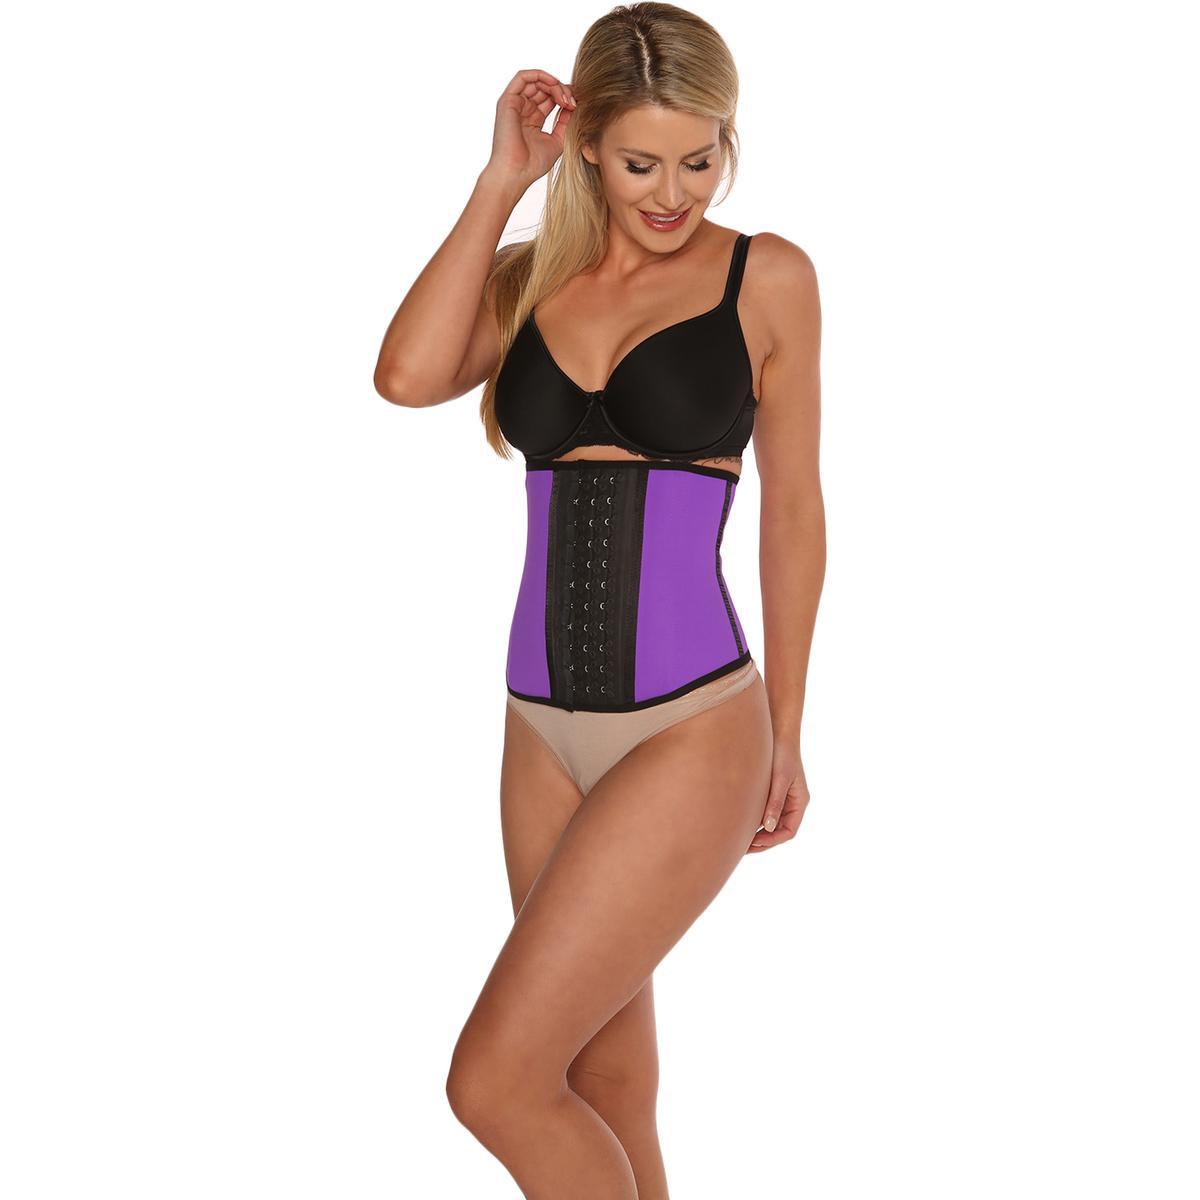 3873b9dc594 Details about Flakisima Womens Slimming Boning Adjustable Waist Trainer  BHFO 8973